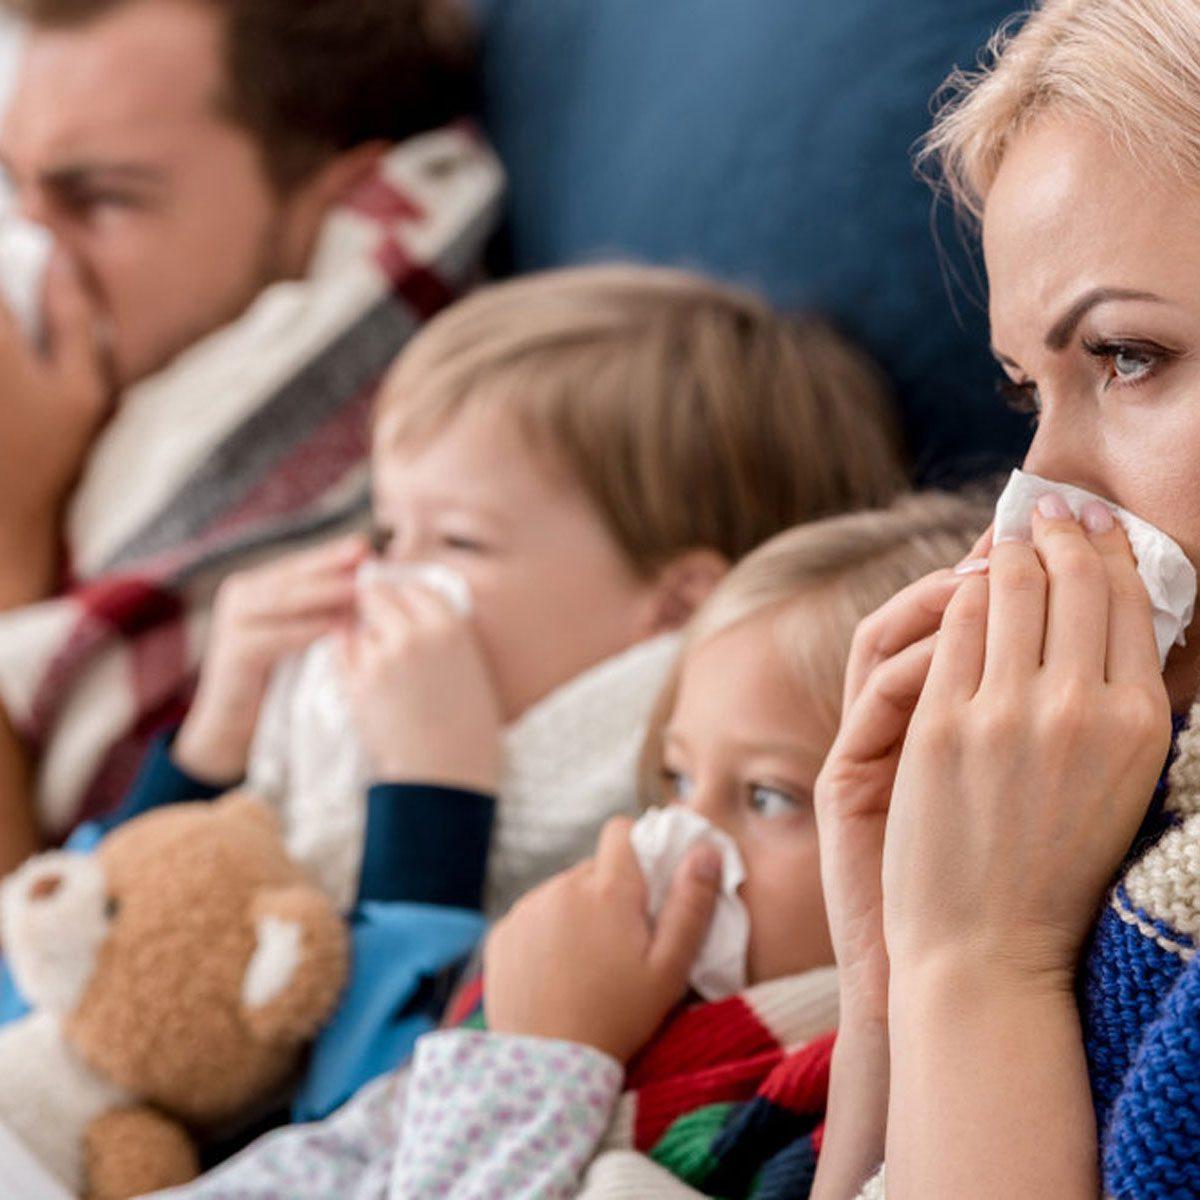 sintomas-gripe-coronavirus-colegio